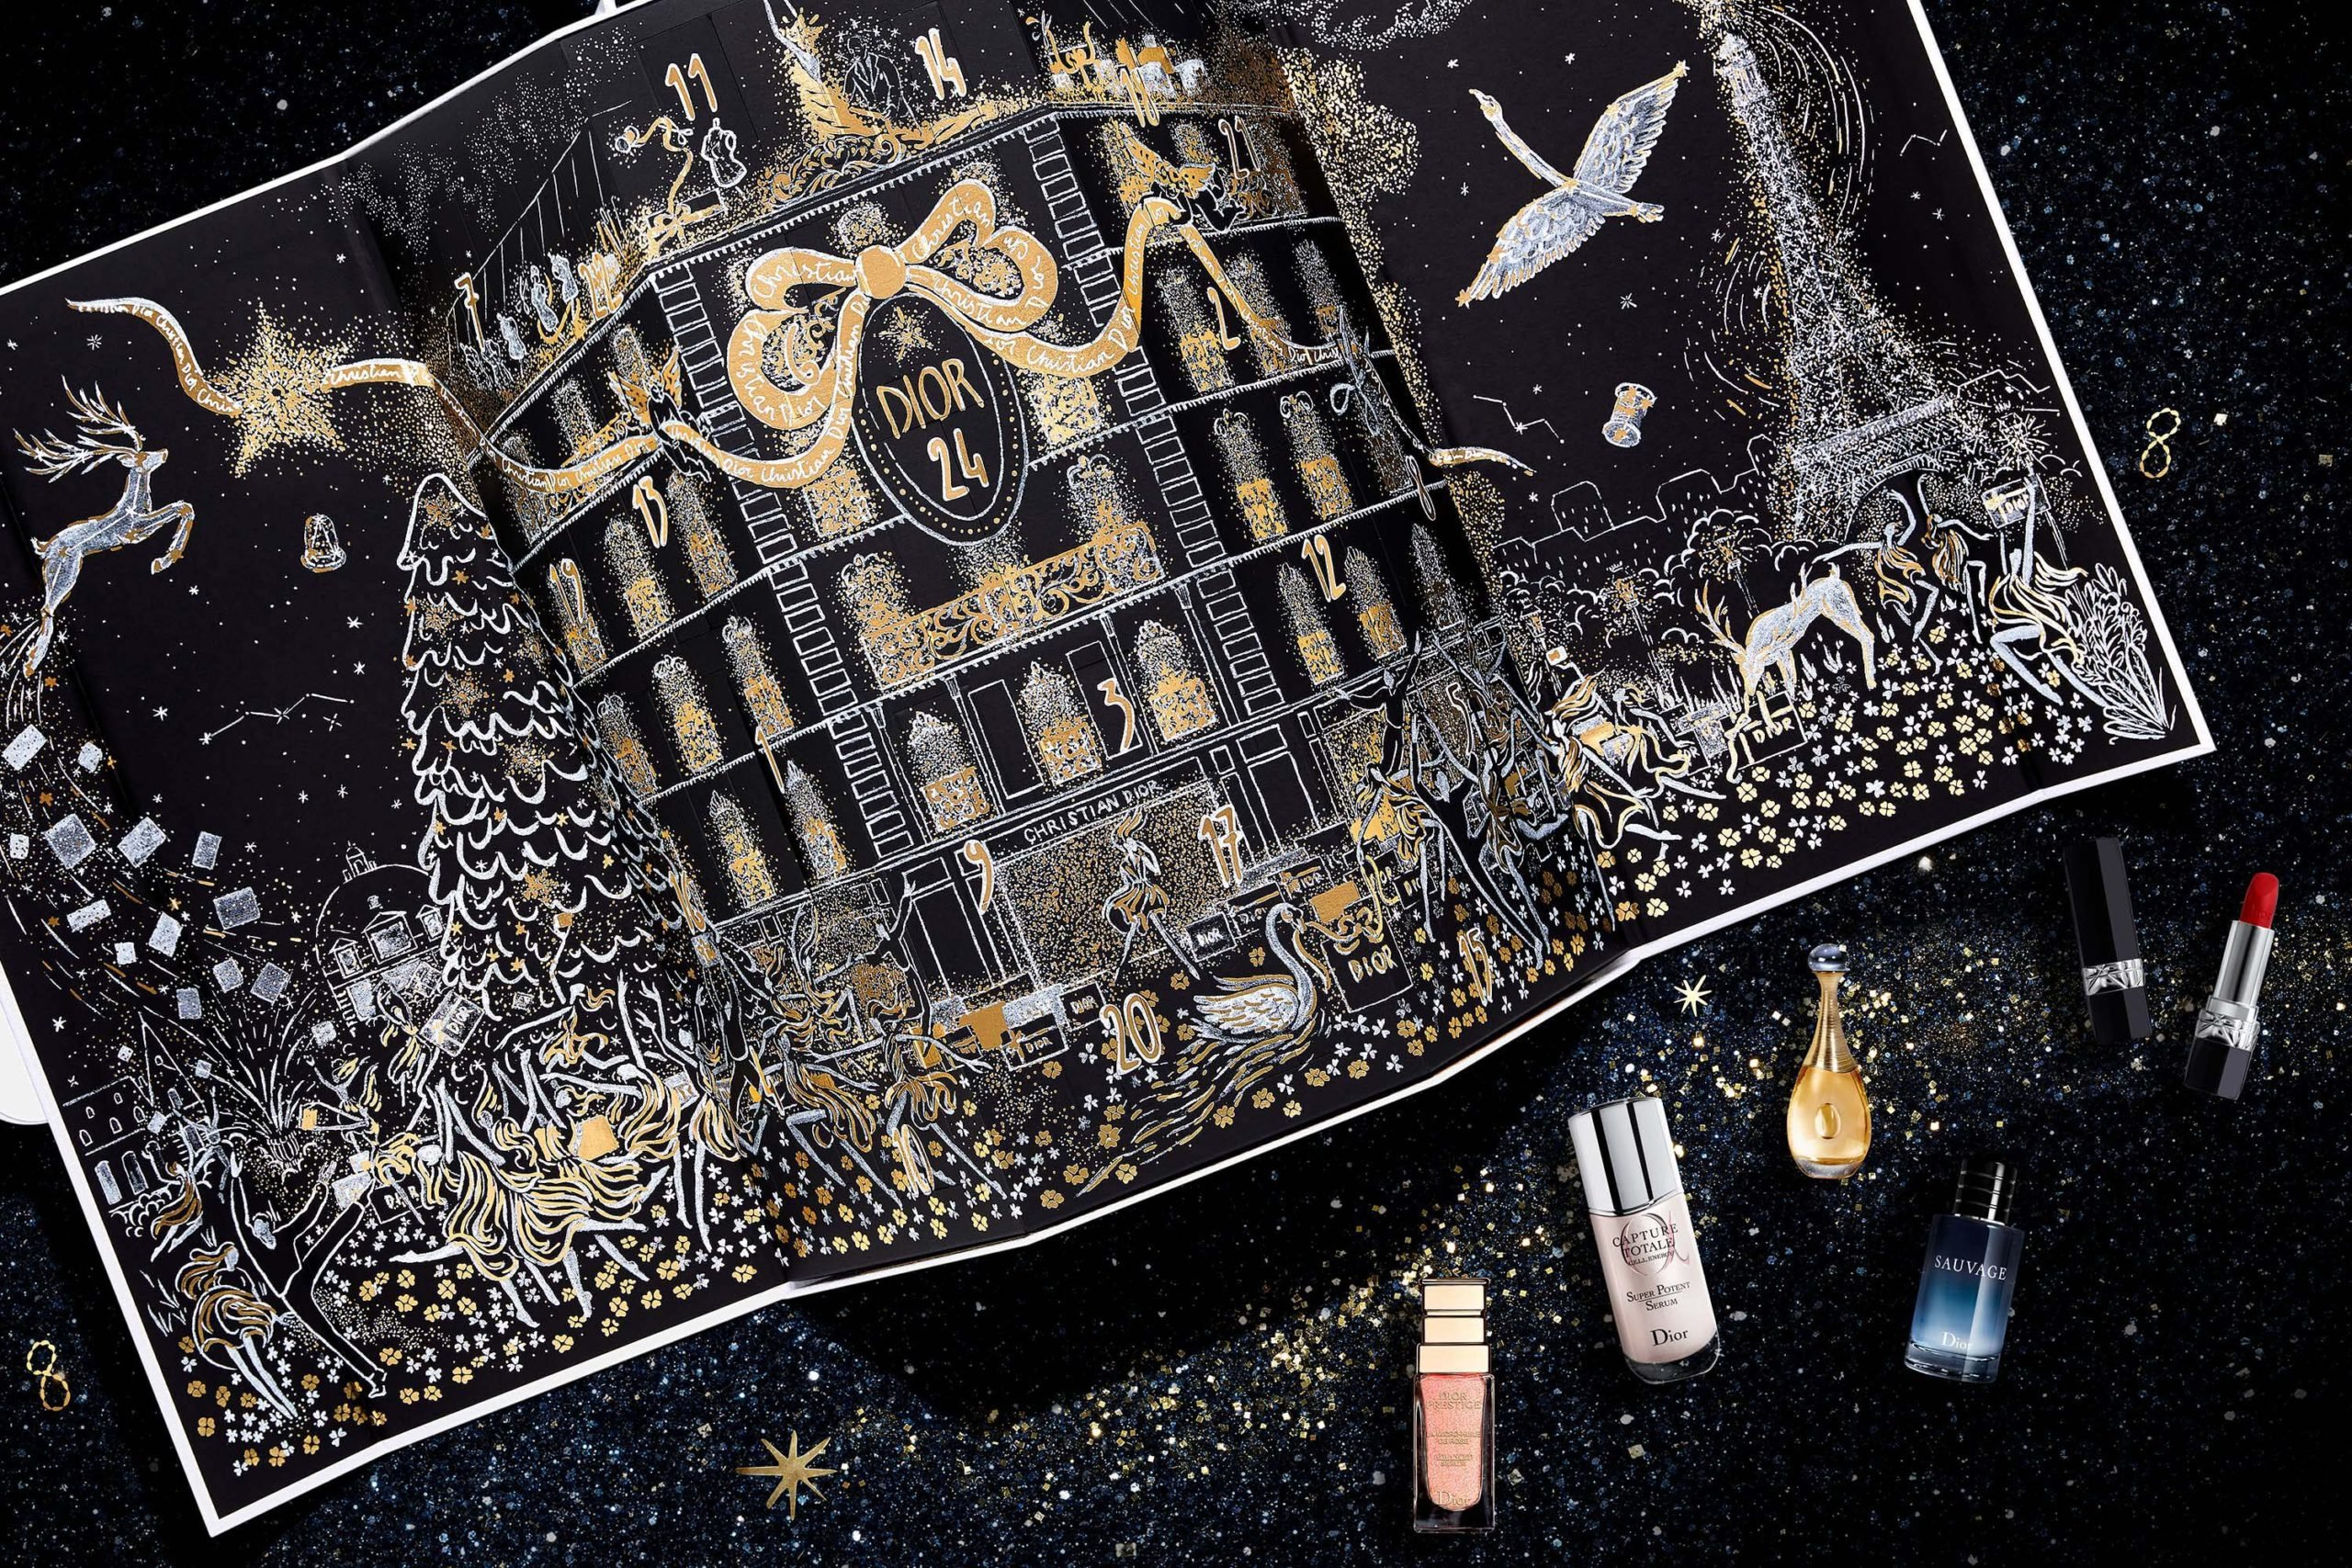 Calendrier de l'Avent de luxe Dior 2020